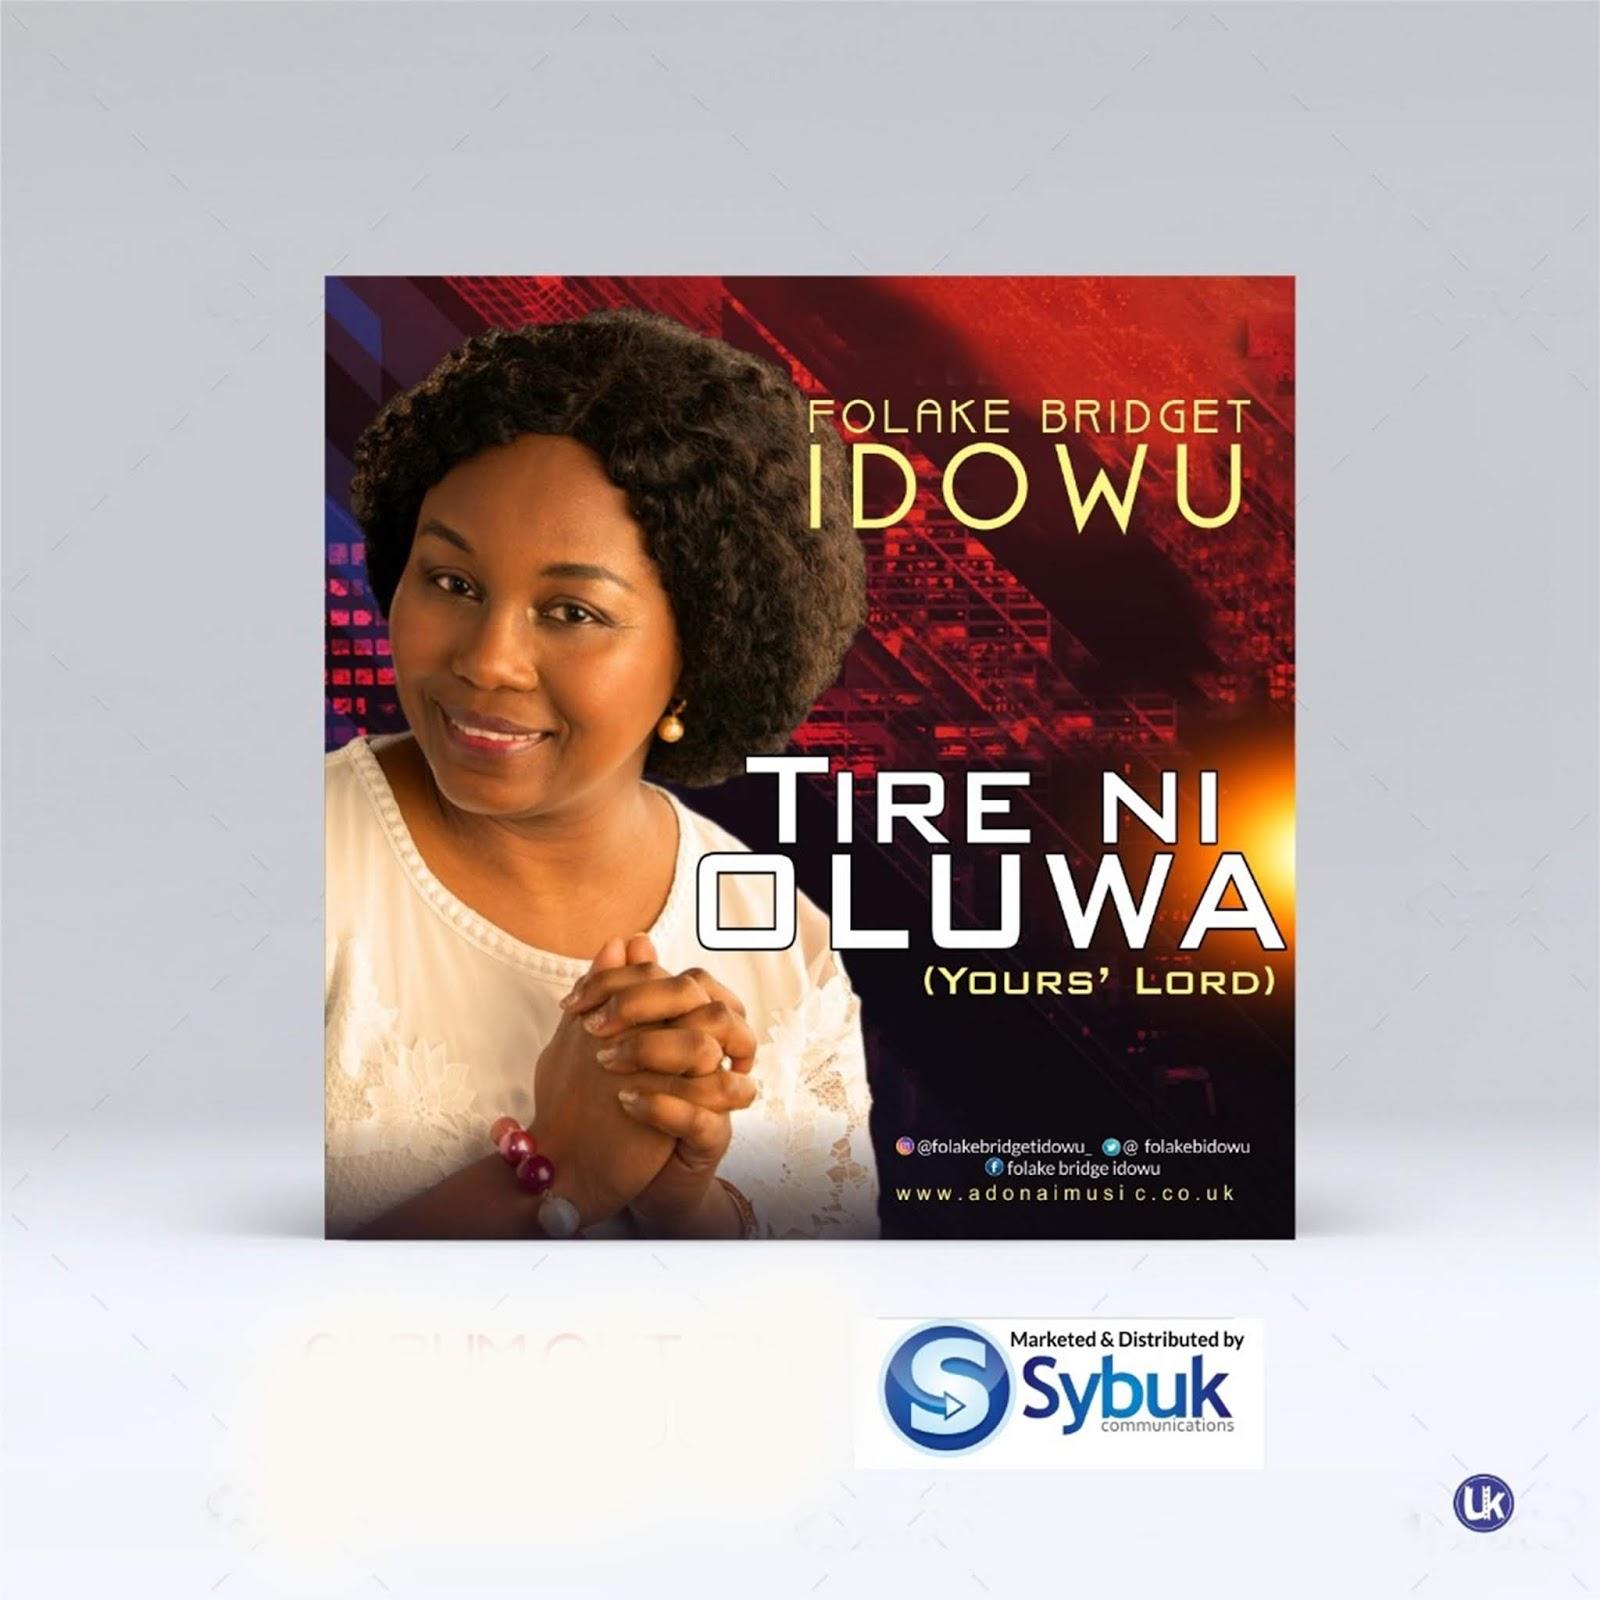 Album: Folake Bridget Idowu – Tire ni || @kehindeamure1 @Folakebidowu